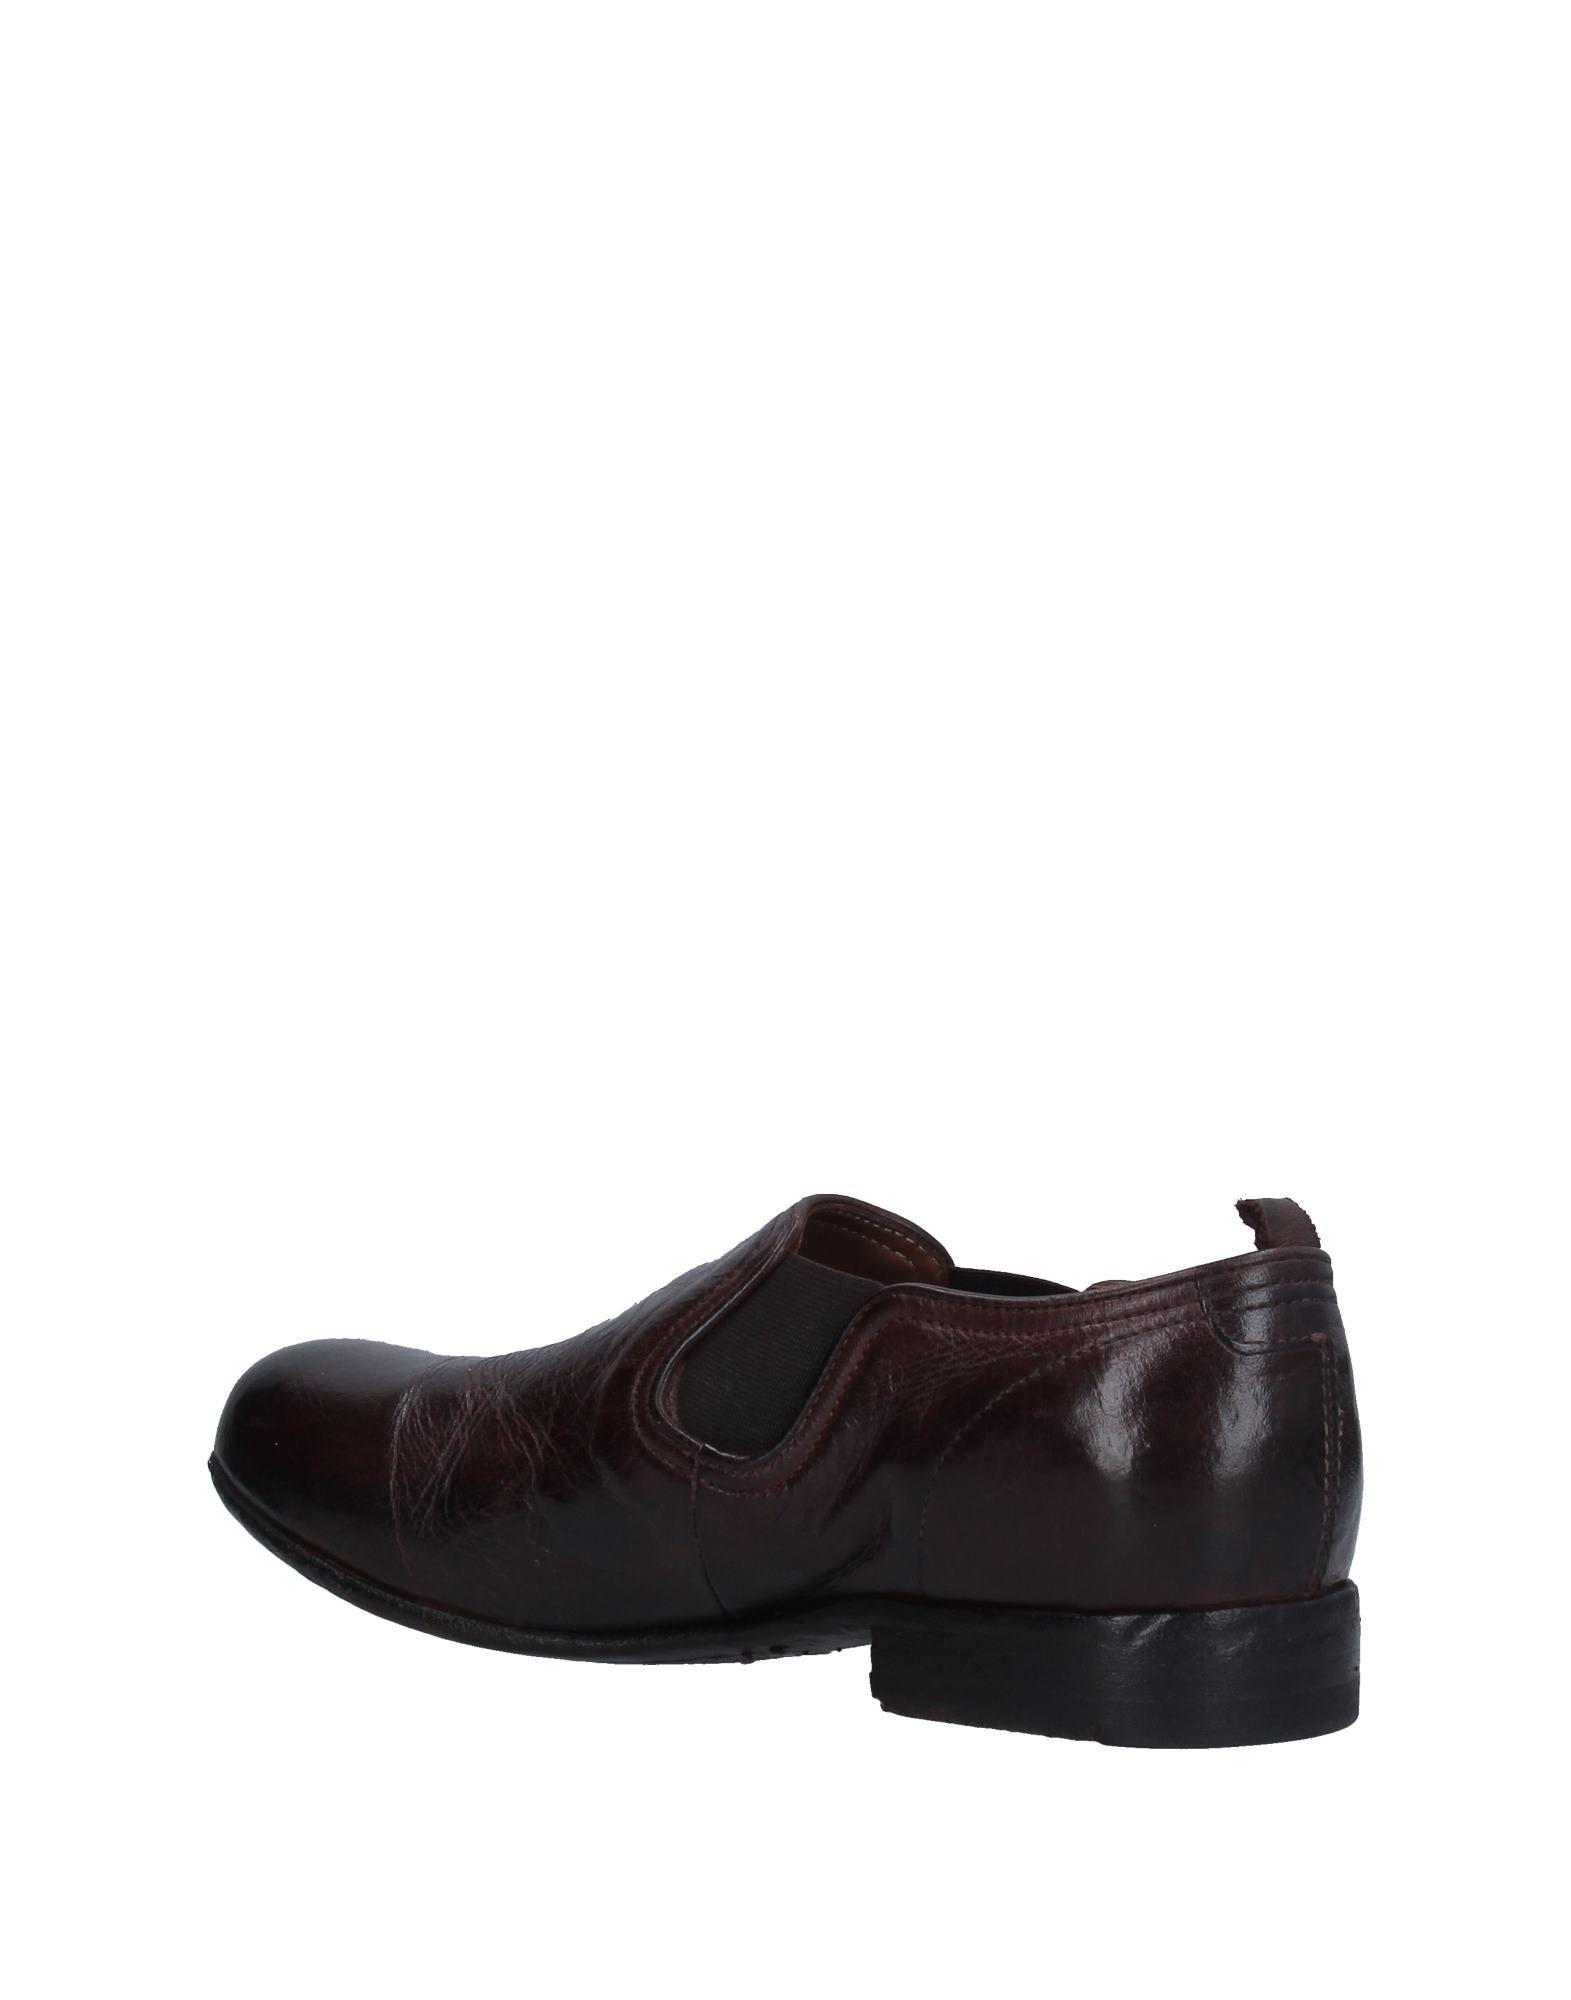 Stilvolle Stiefelette billige Schuhe Sartori Gold Stiefelette Stilvolle Damen  11249940UA 19f97a